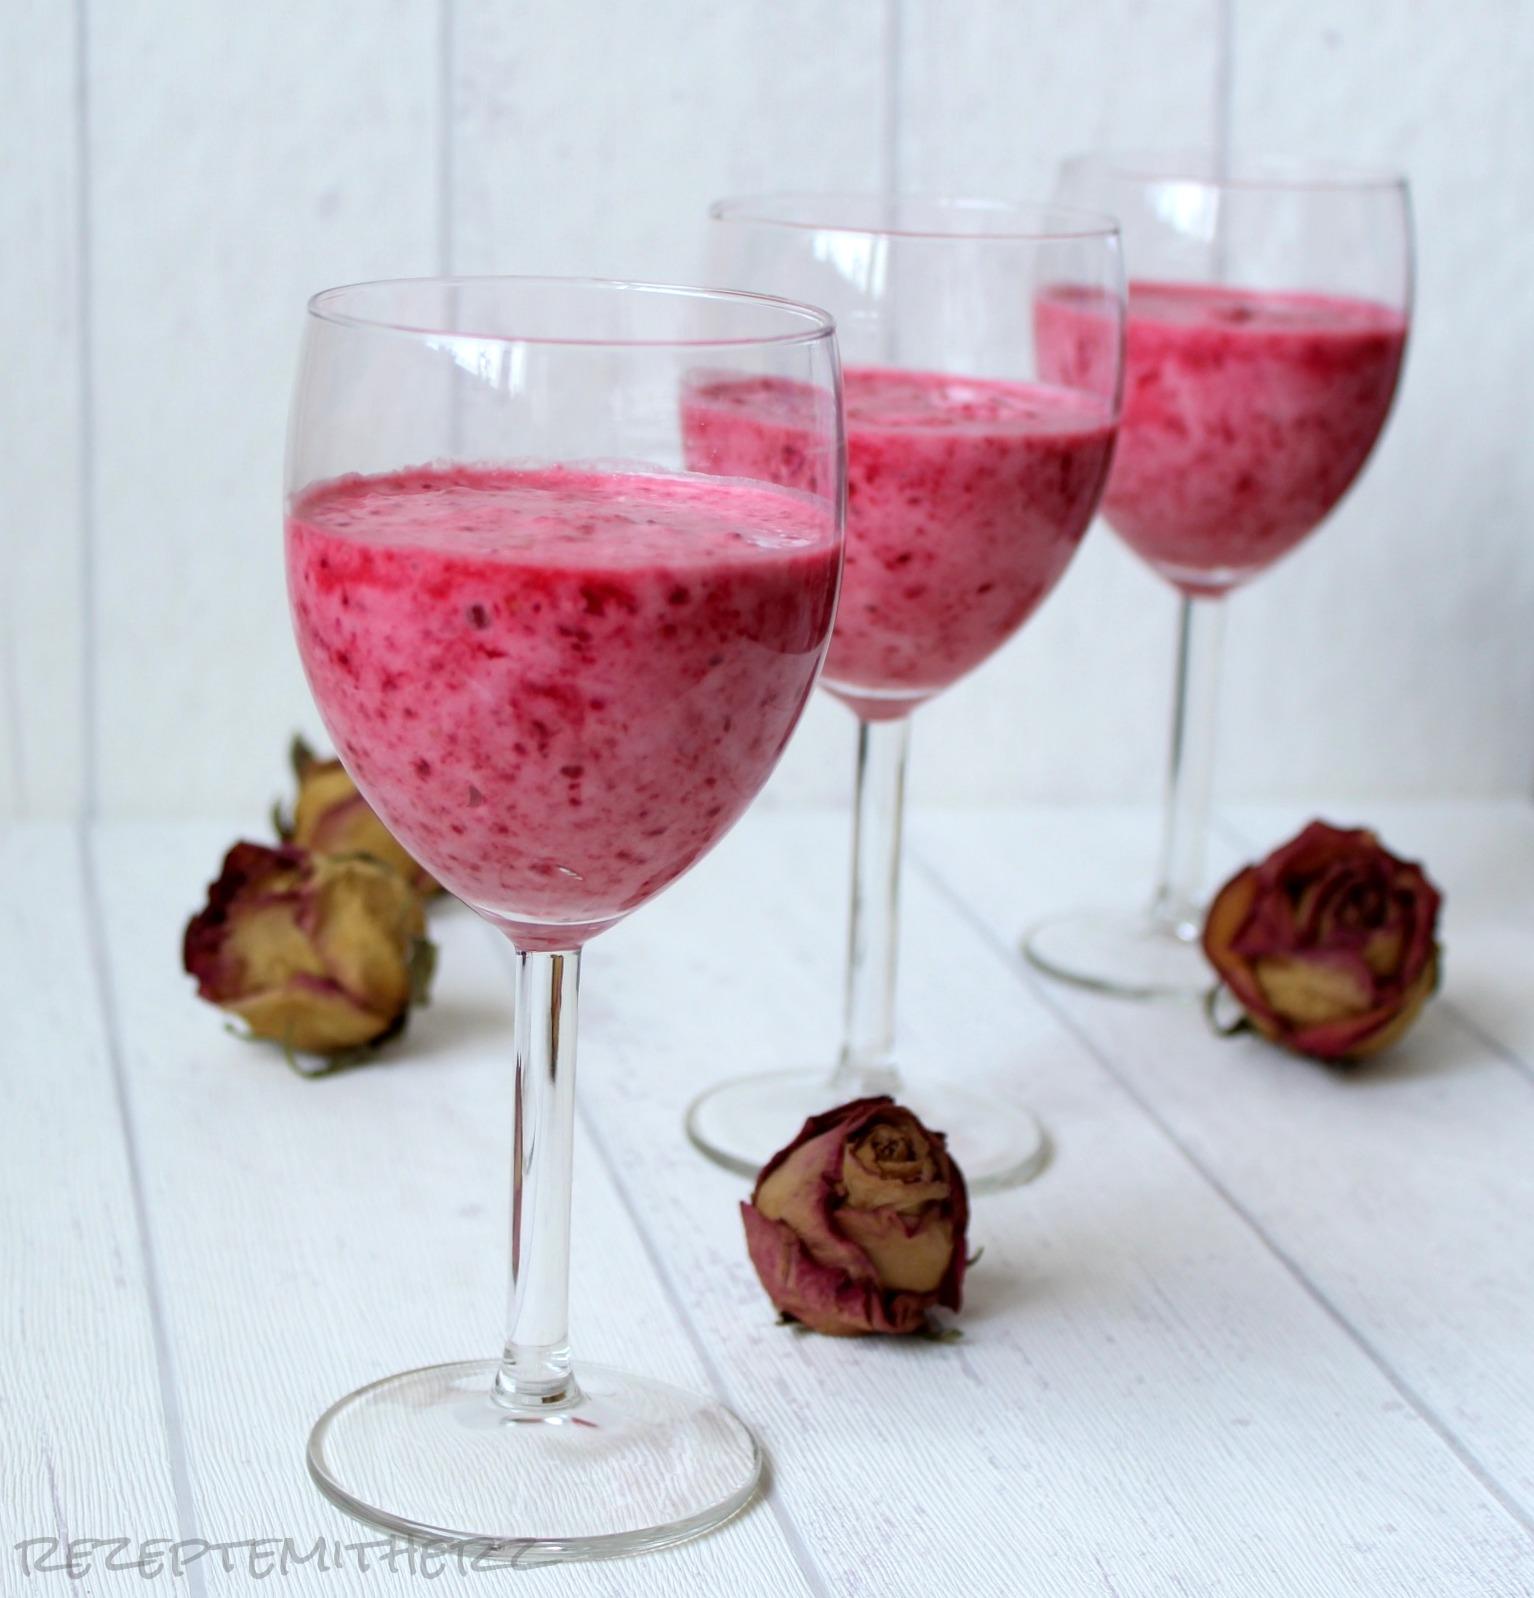 rezepte mit herz himbeer creme dessert raspberry cream. Black Bedroom Furniture Sets. Home Design Ideas